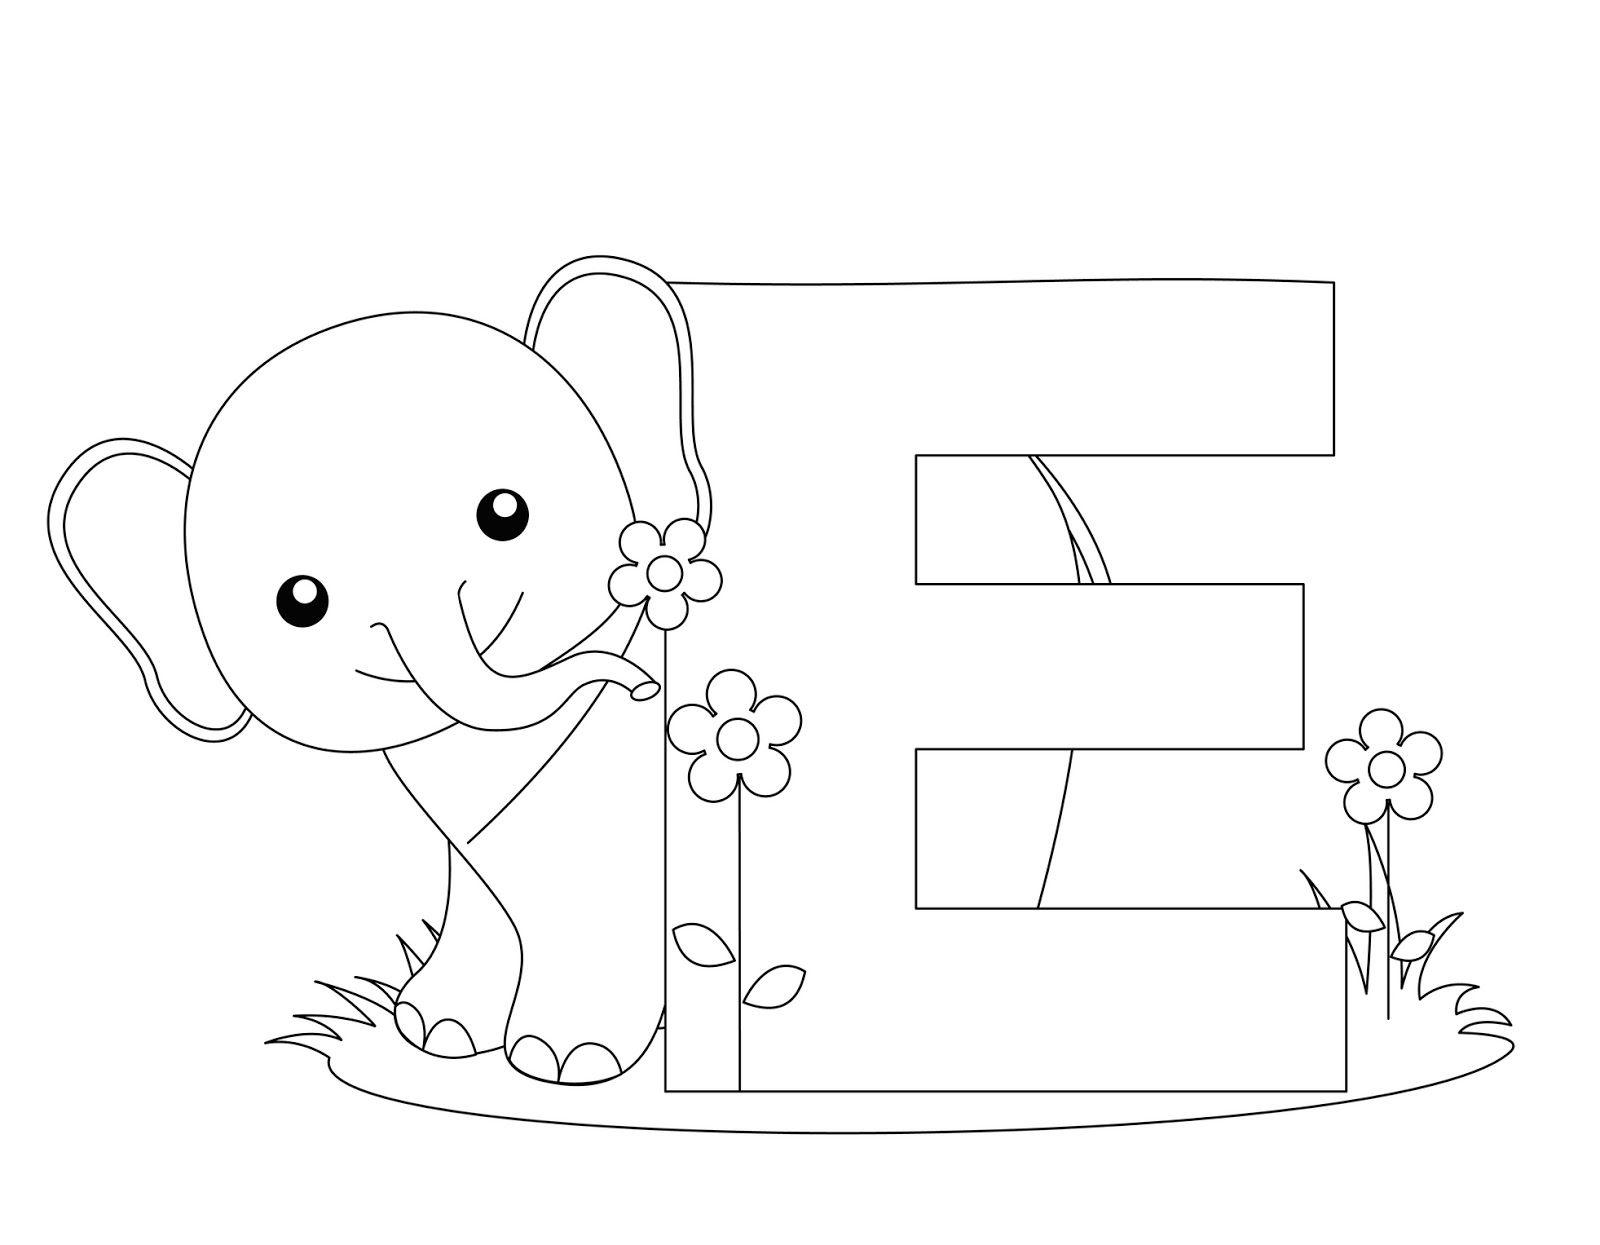 Animal Alphabet Letter E Coloring Elephant Abc Coloring Pages Elephant Coloring Page Abc Coloring